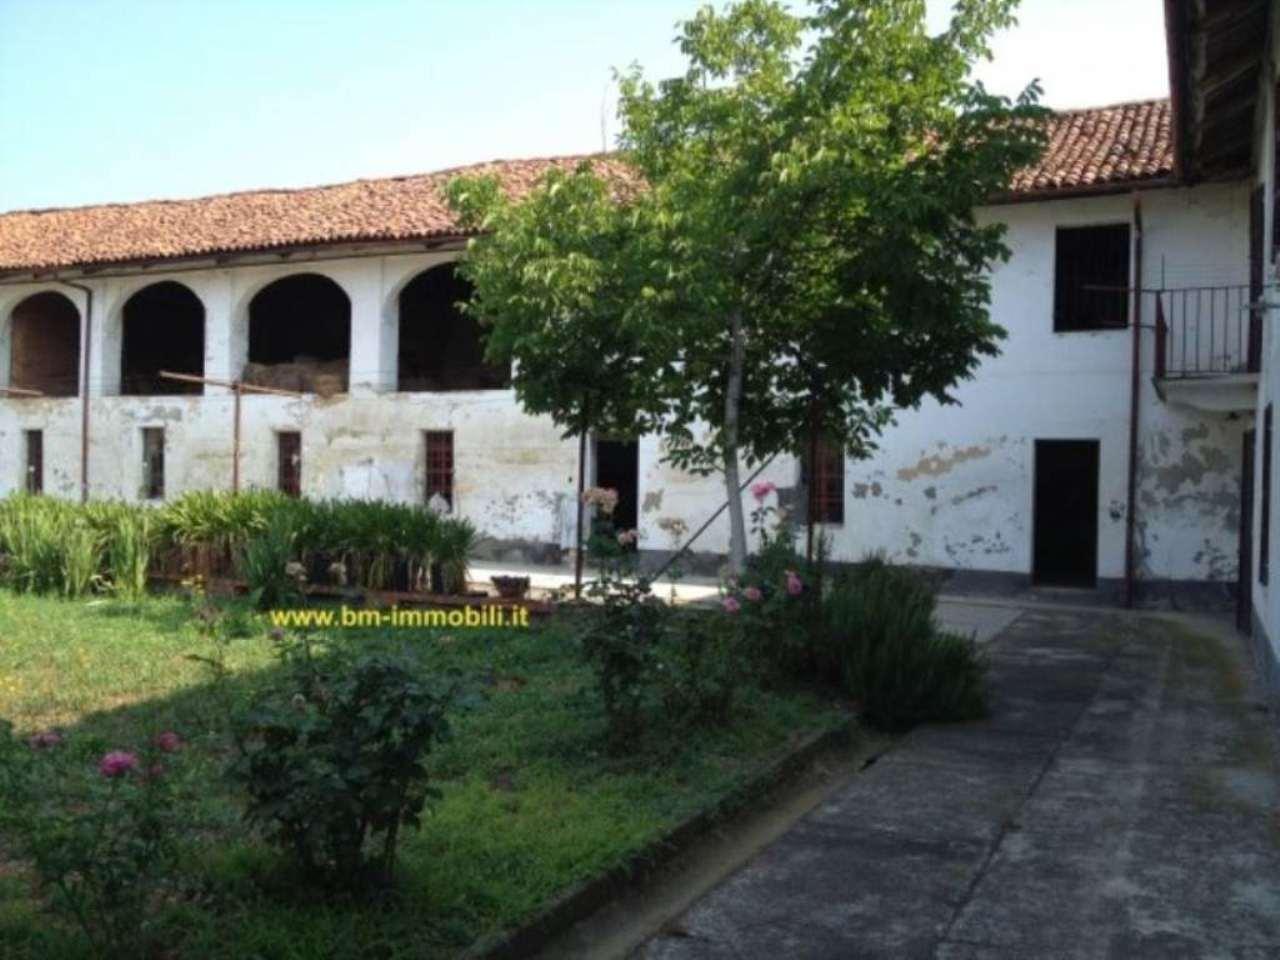 Rustico / Casale in Vendita a Villafranca d'Asti